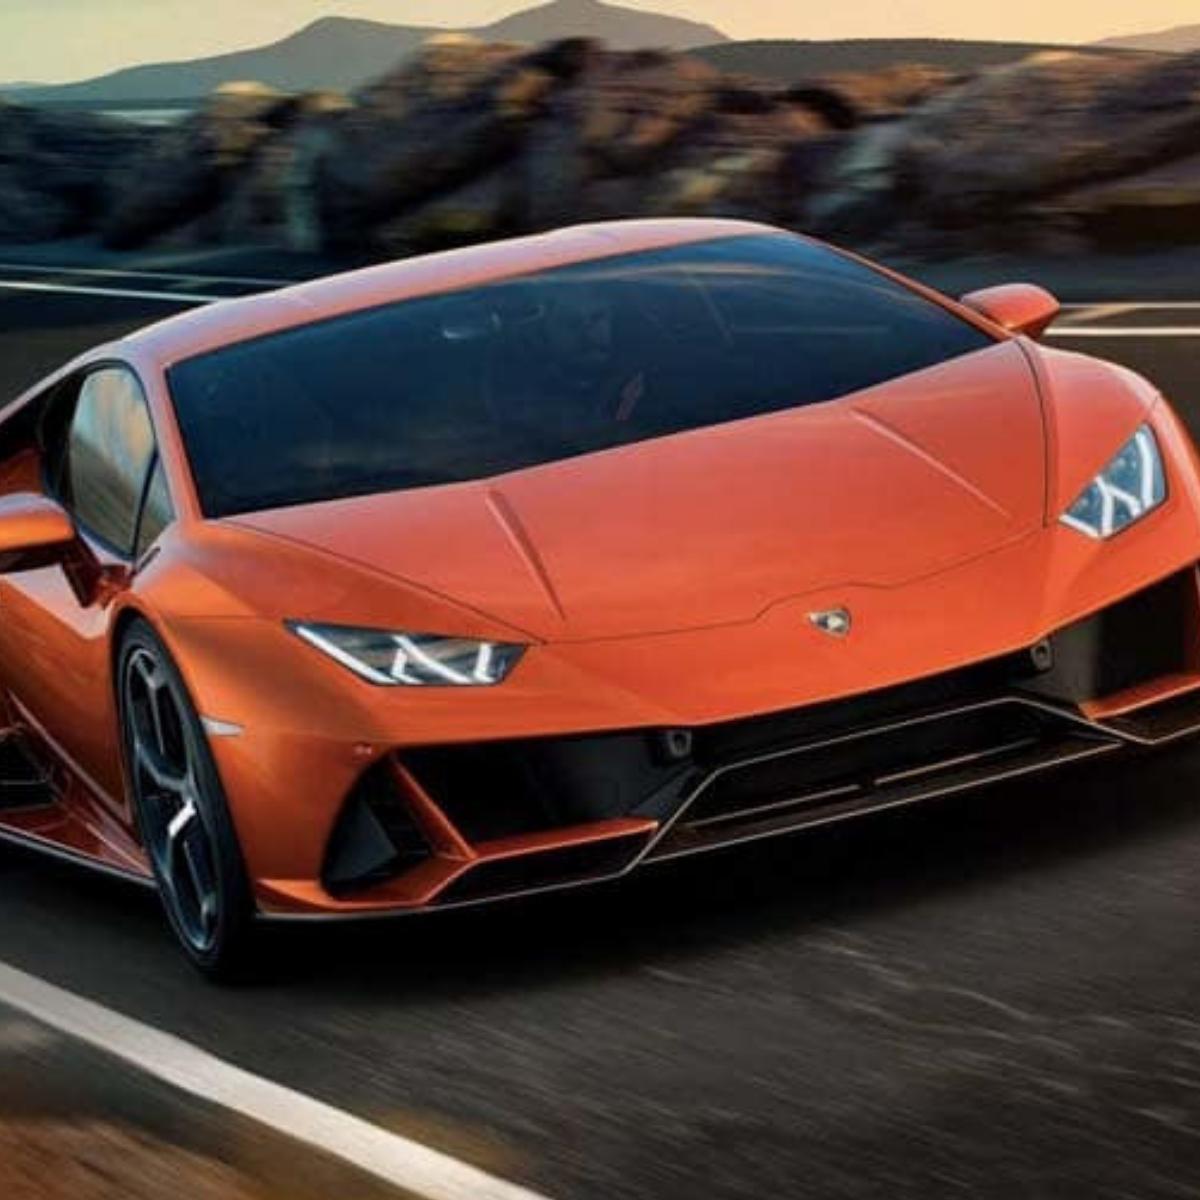 Lamborghini Huracan Evo Launched In India Check Out The Prices Lamborghini Huracan Lamborghini Super Sport Cars